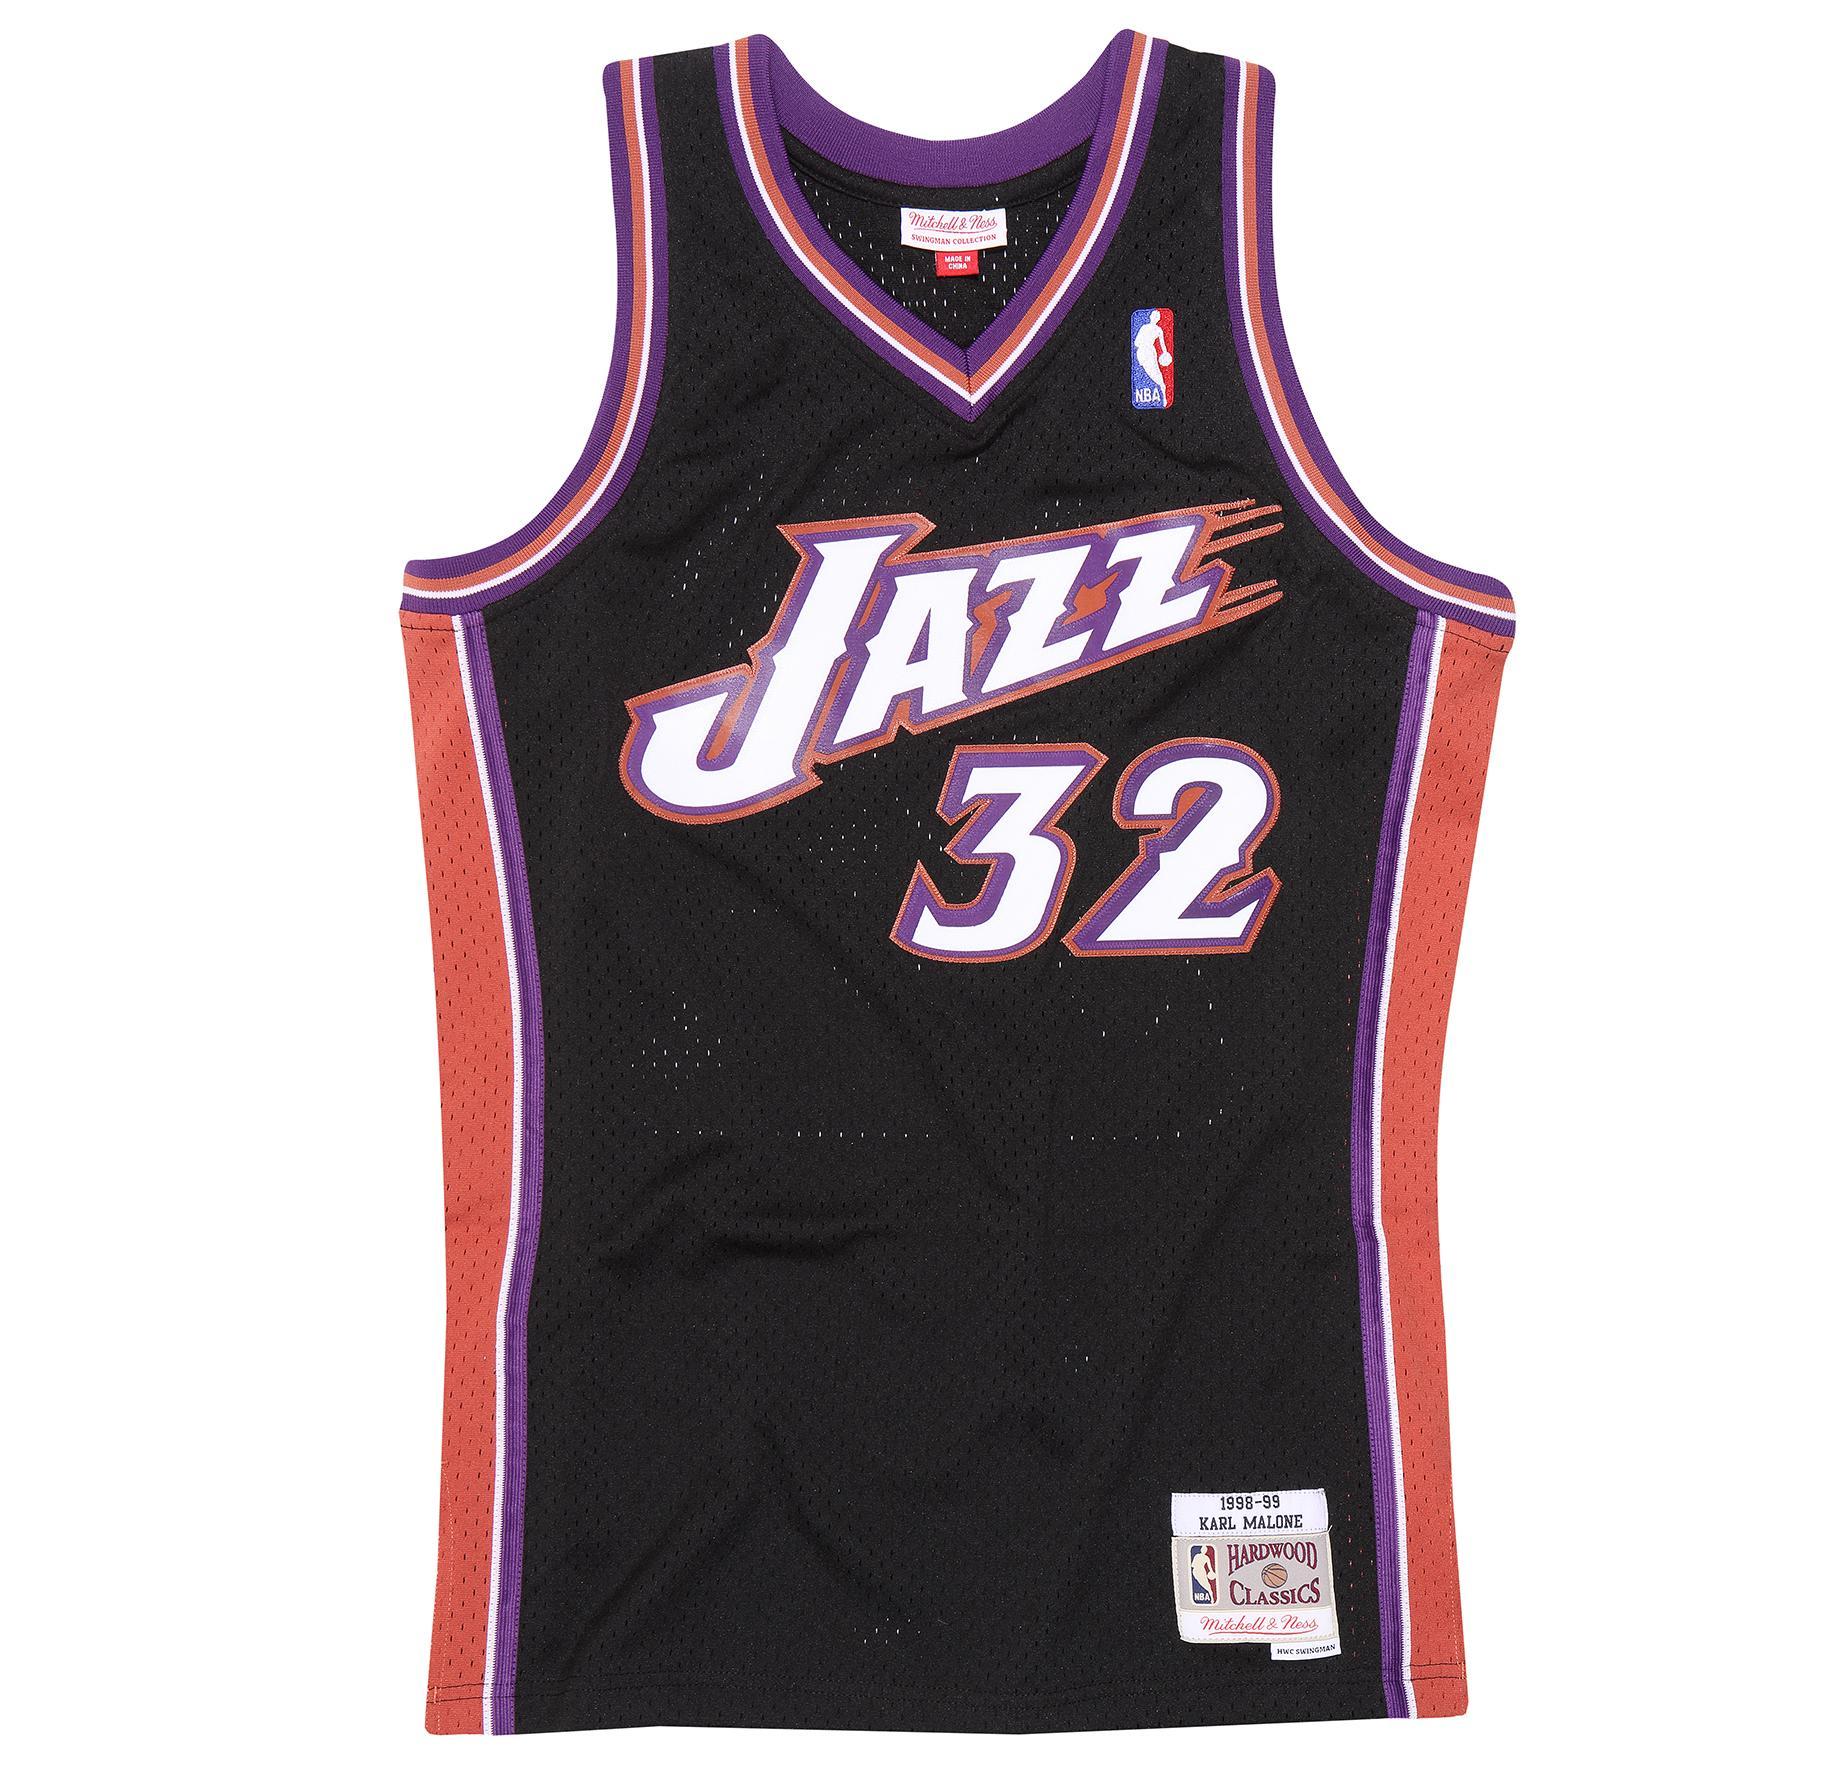 e8829a47f Karl Malone 1998-99 Swingman Jersey Utah Jazz